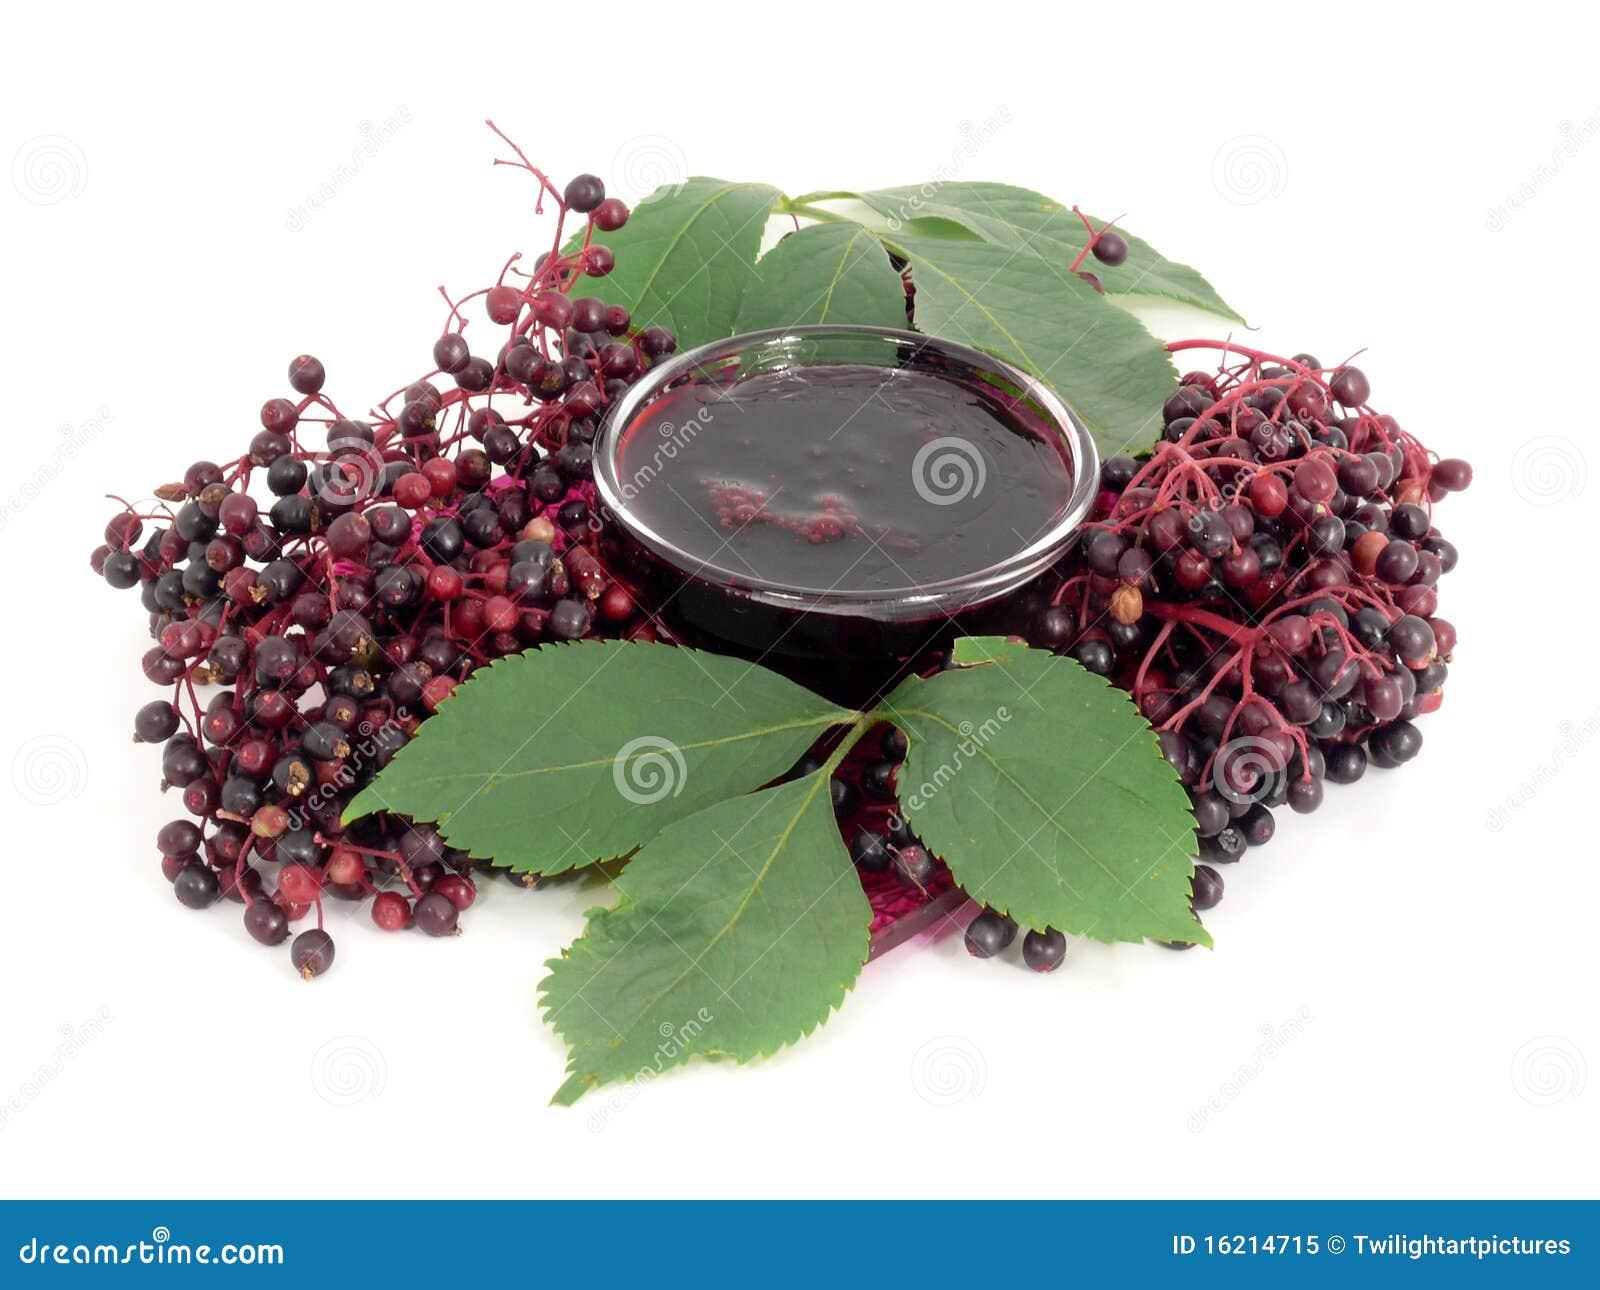 Elderberry Jelly Royalty Free Stock Photo - Image: 16214715